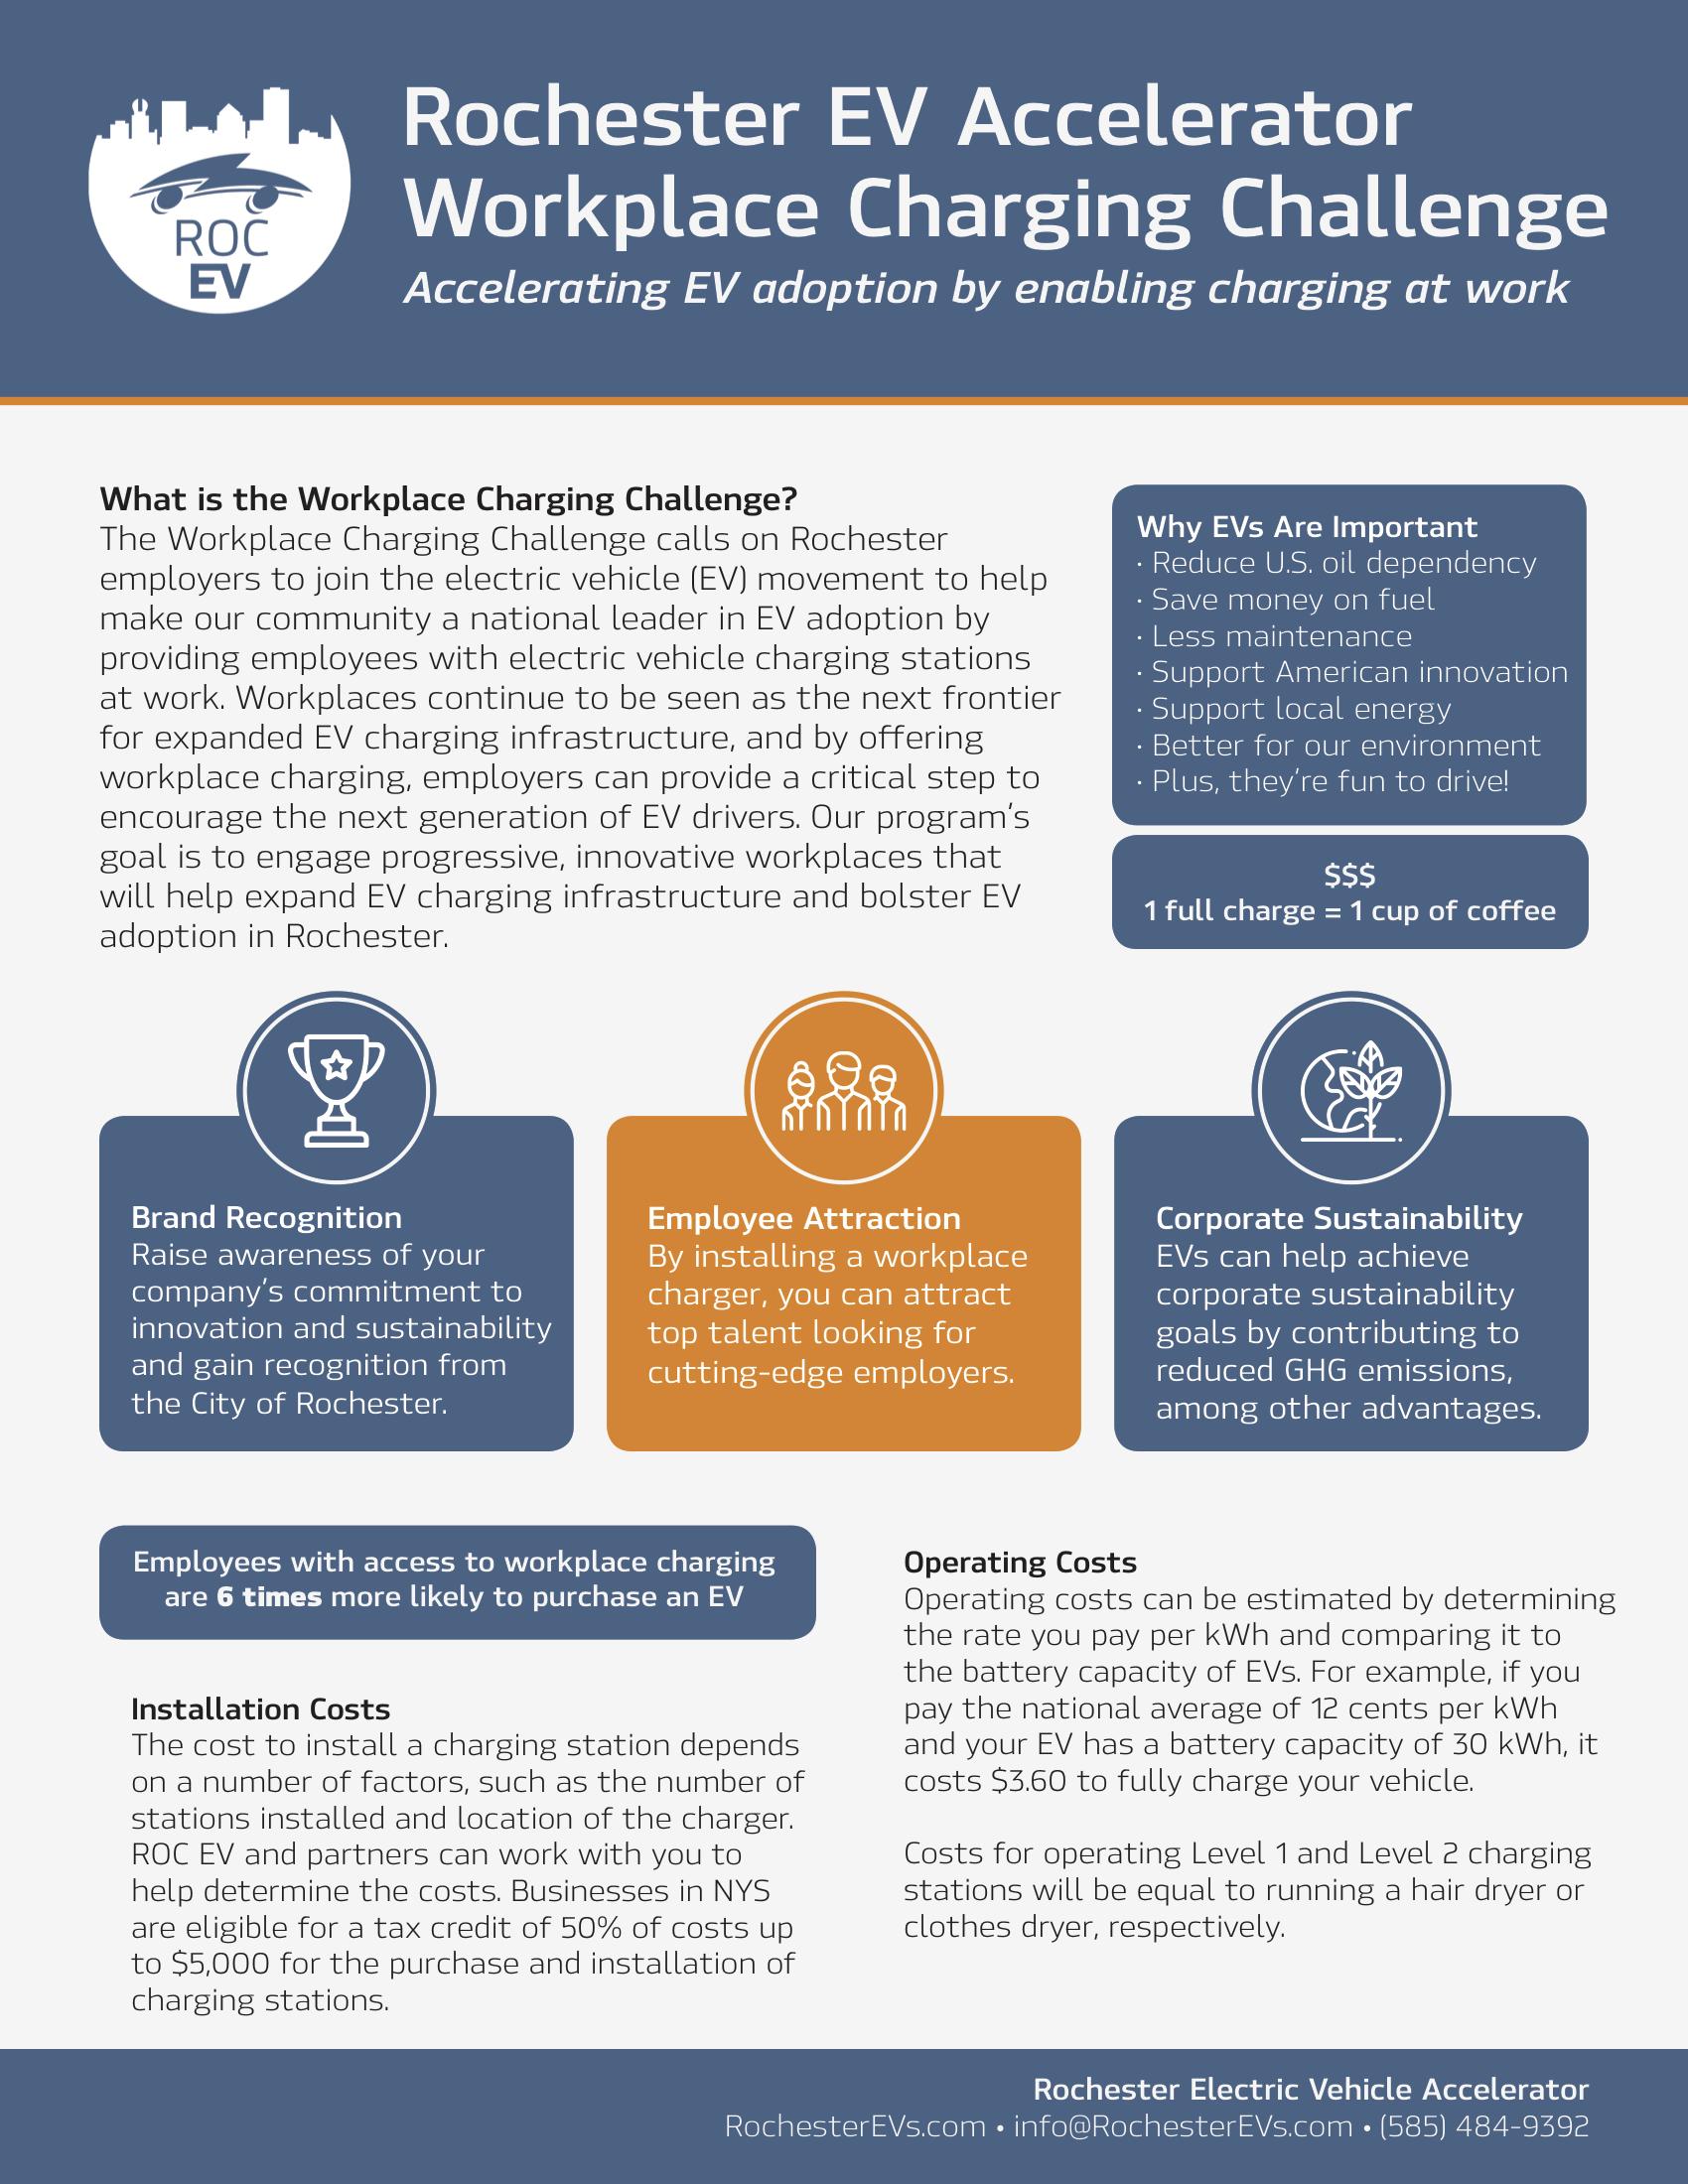 Workplace Charging Rochester Ev Accelerator Evs Car Alarm Wiring Diagram 2 Roc Challenge Pledge Above